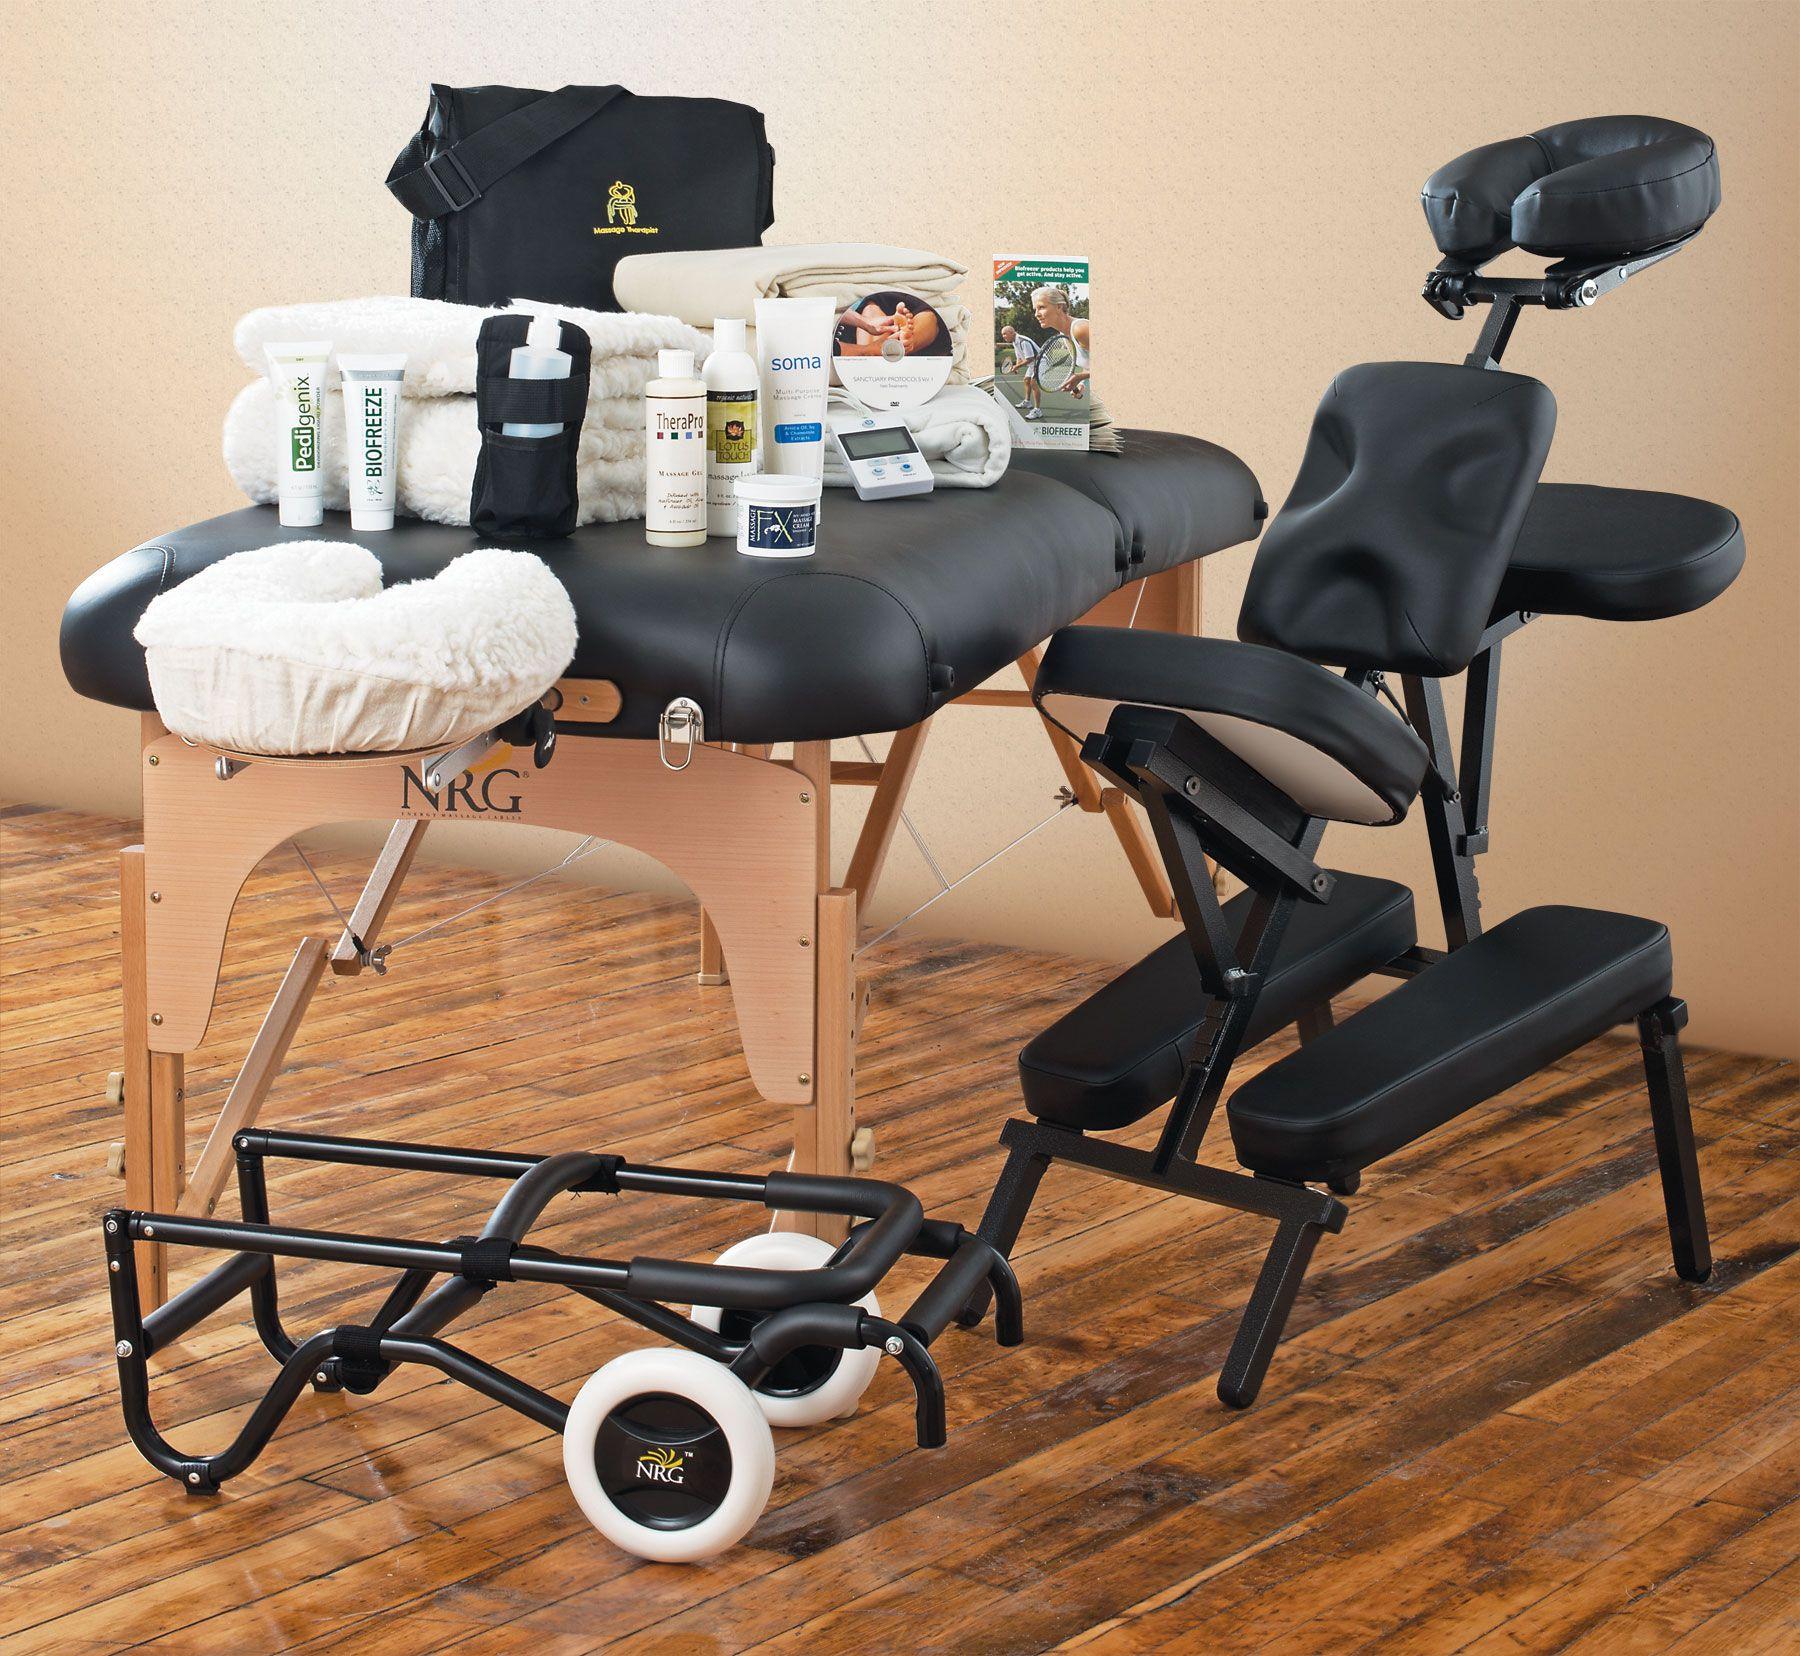 Nrg Karma Massage Table Chair Cart Massage Business Kit